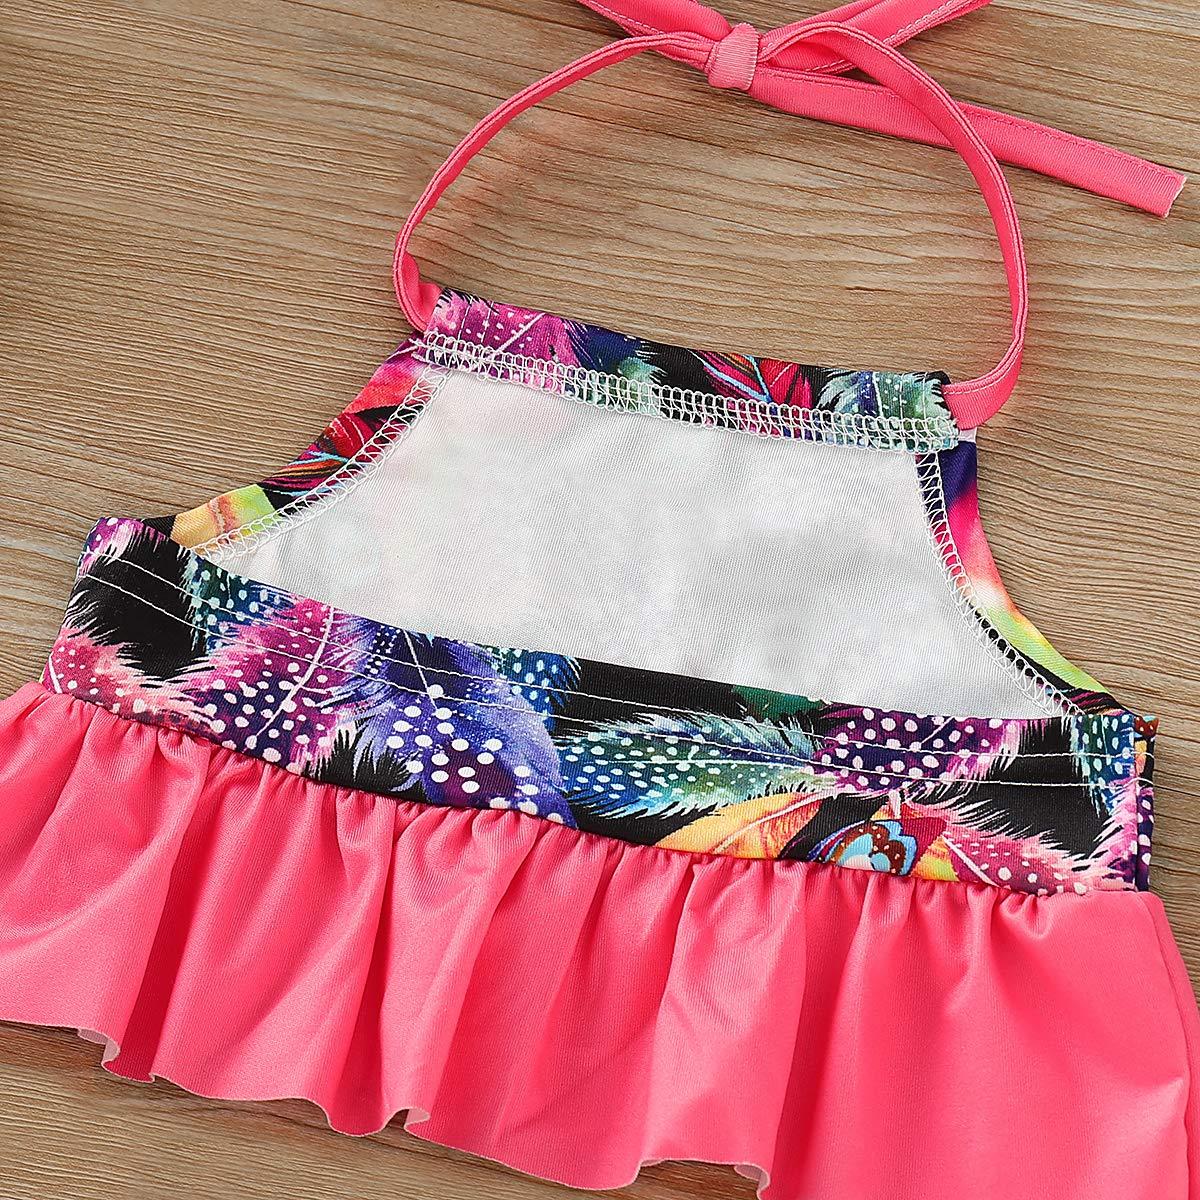 RUSHAIBAR Baby//Toddler Girls Bikini 2-Piece Swimsuit with Feather